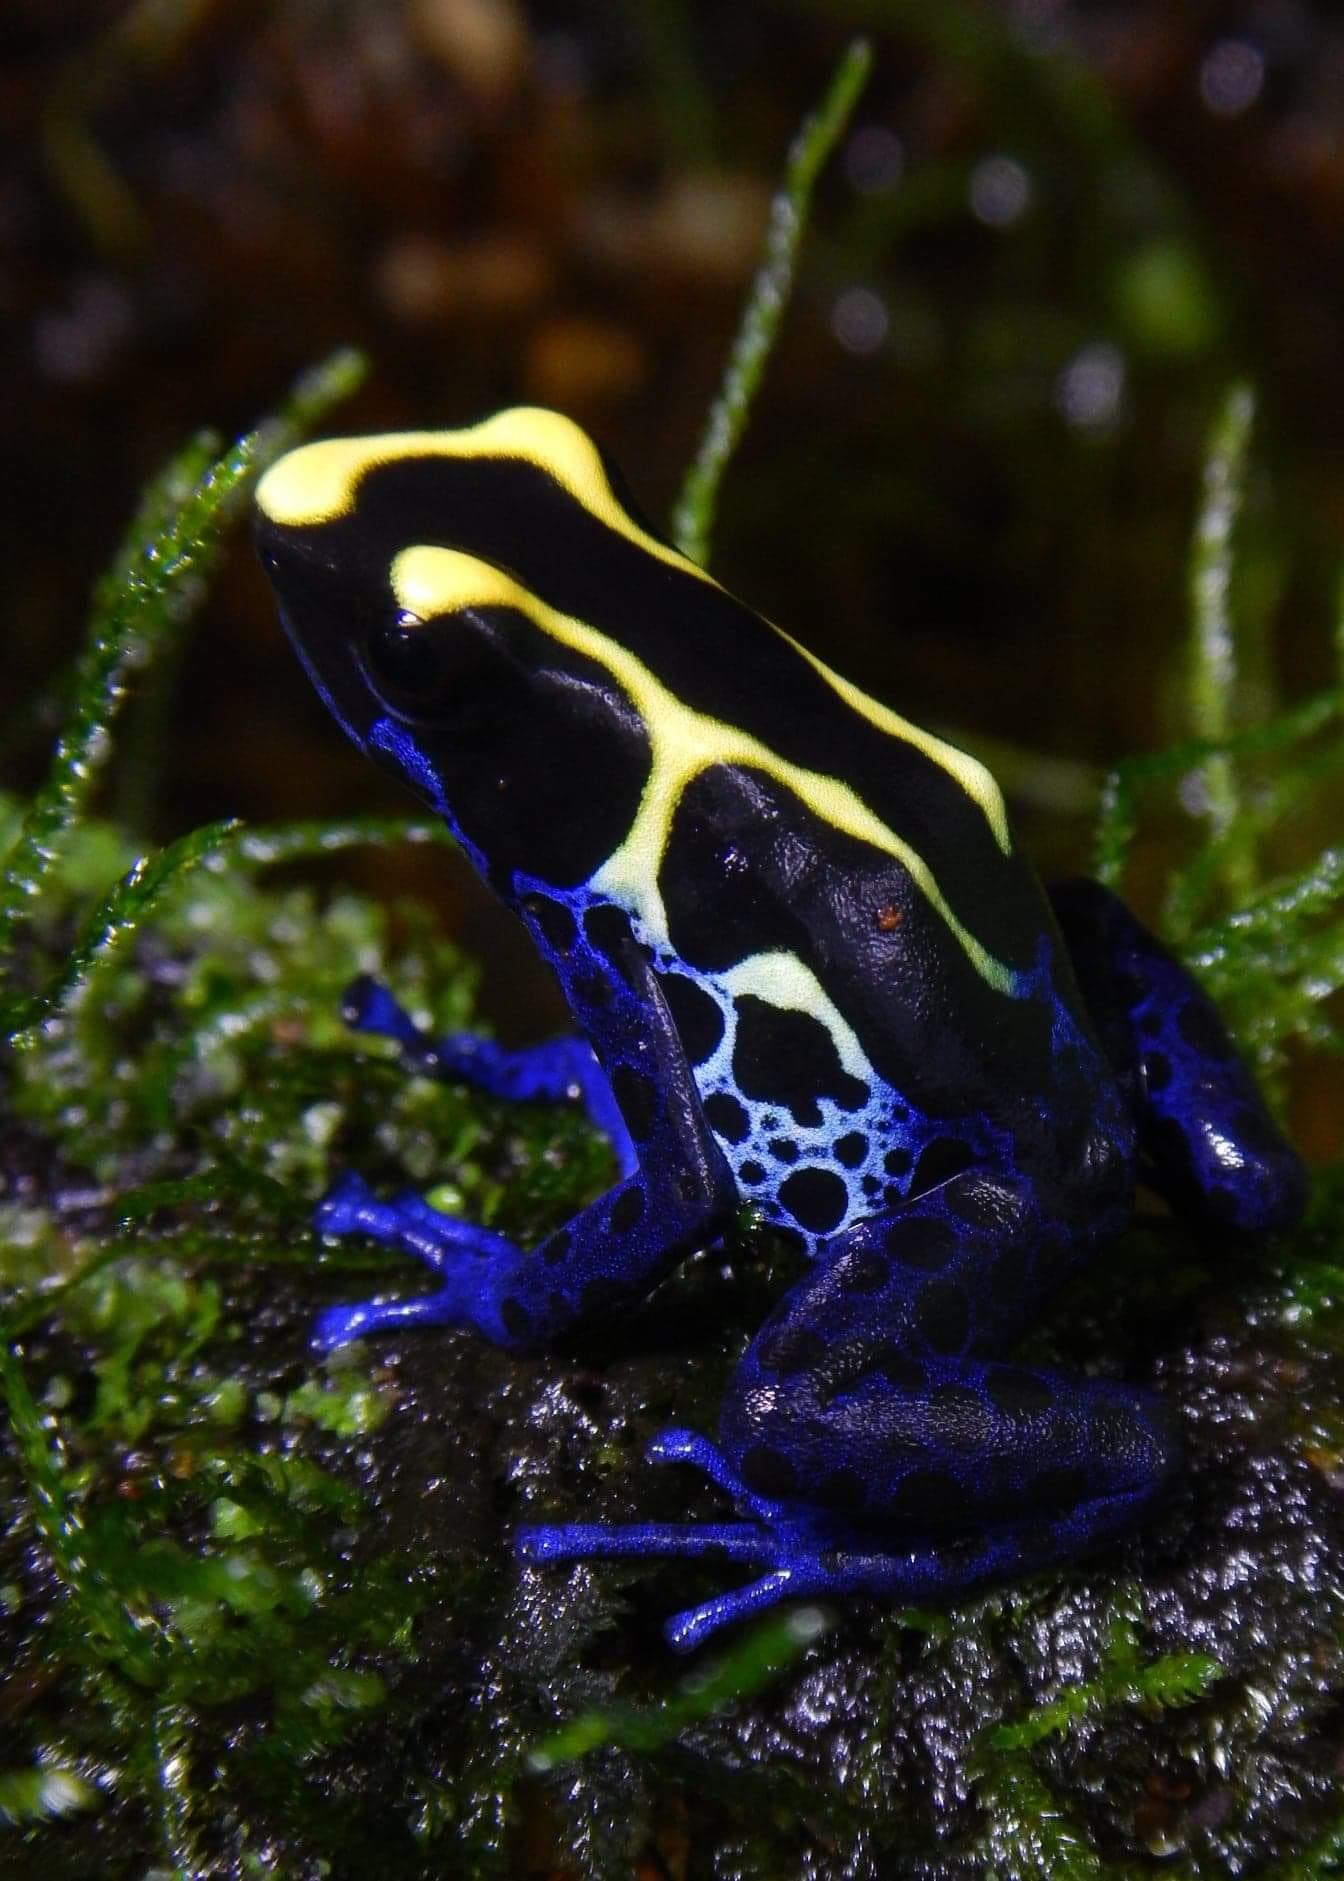 Dendrobates tinctorius 'Dwarf Cobalt' (froglet)